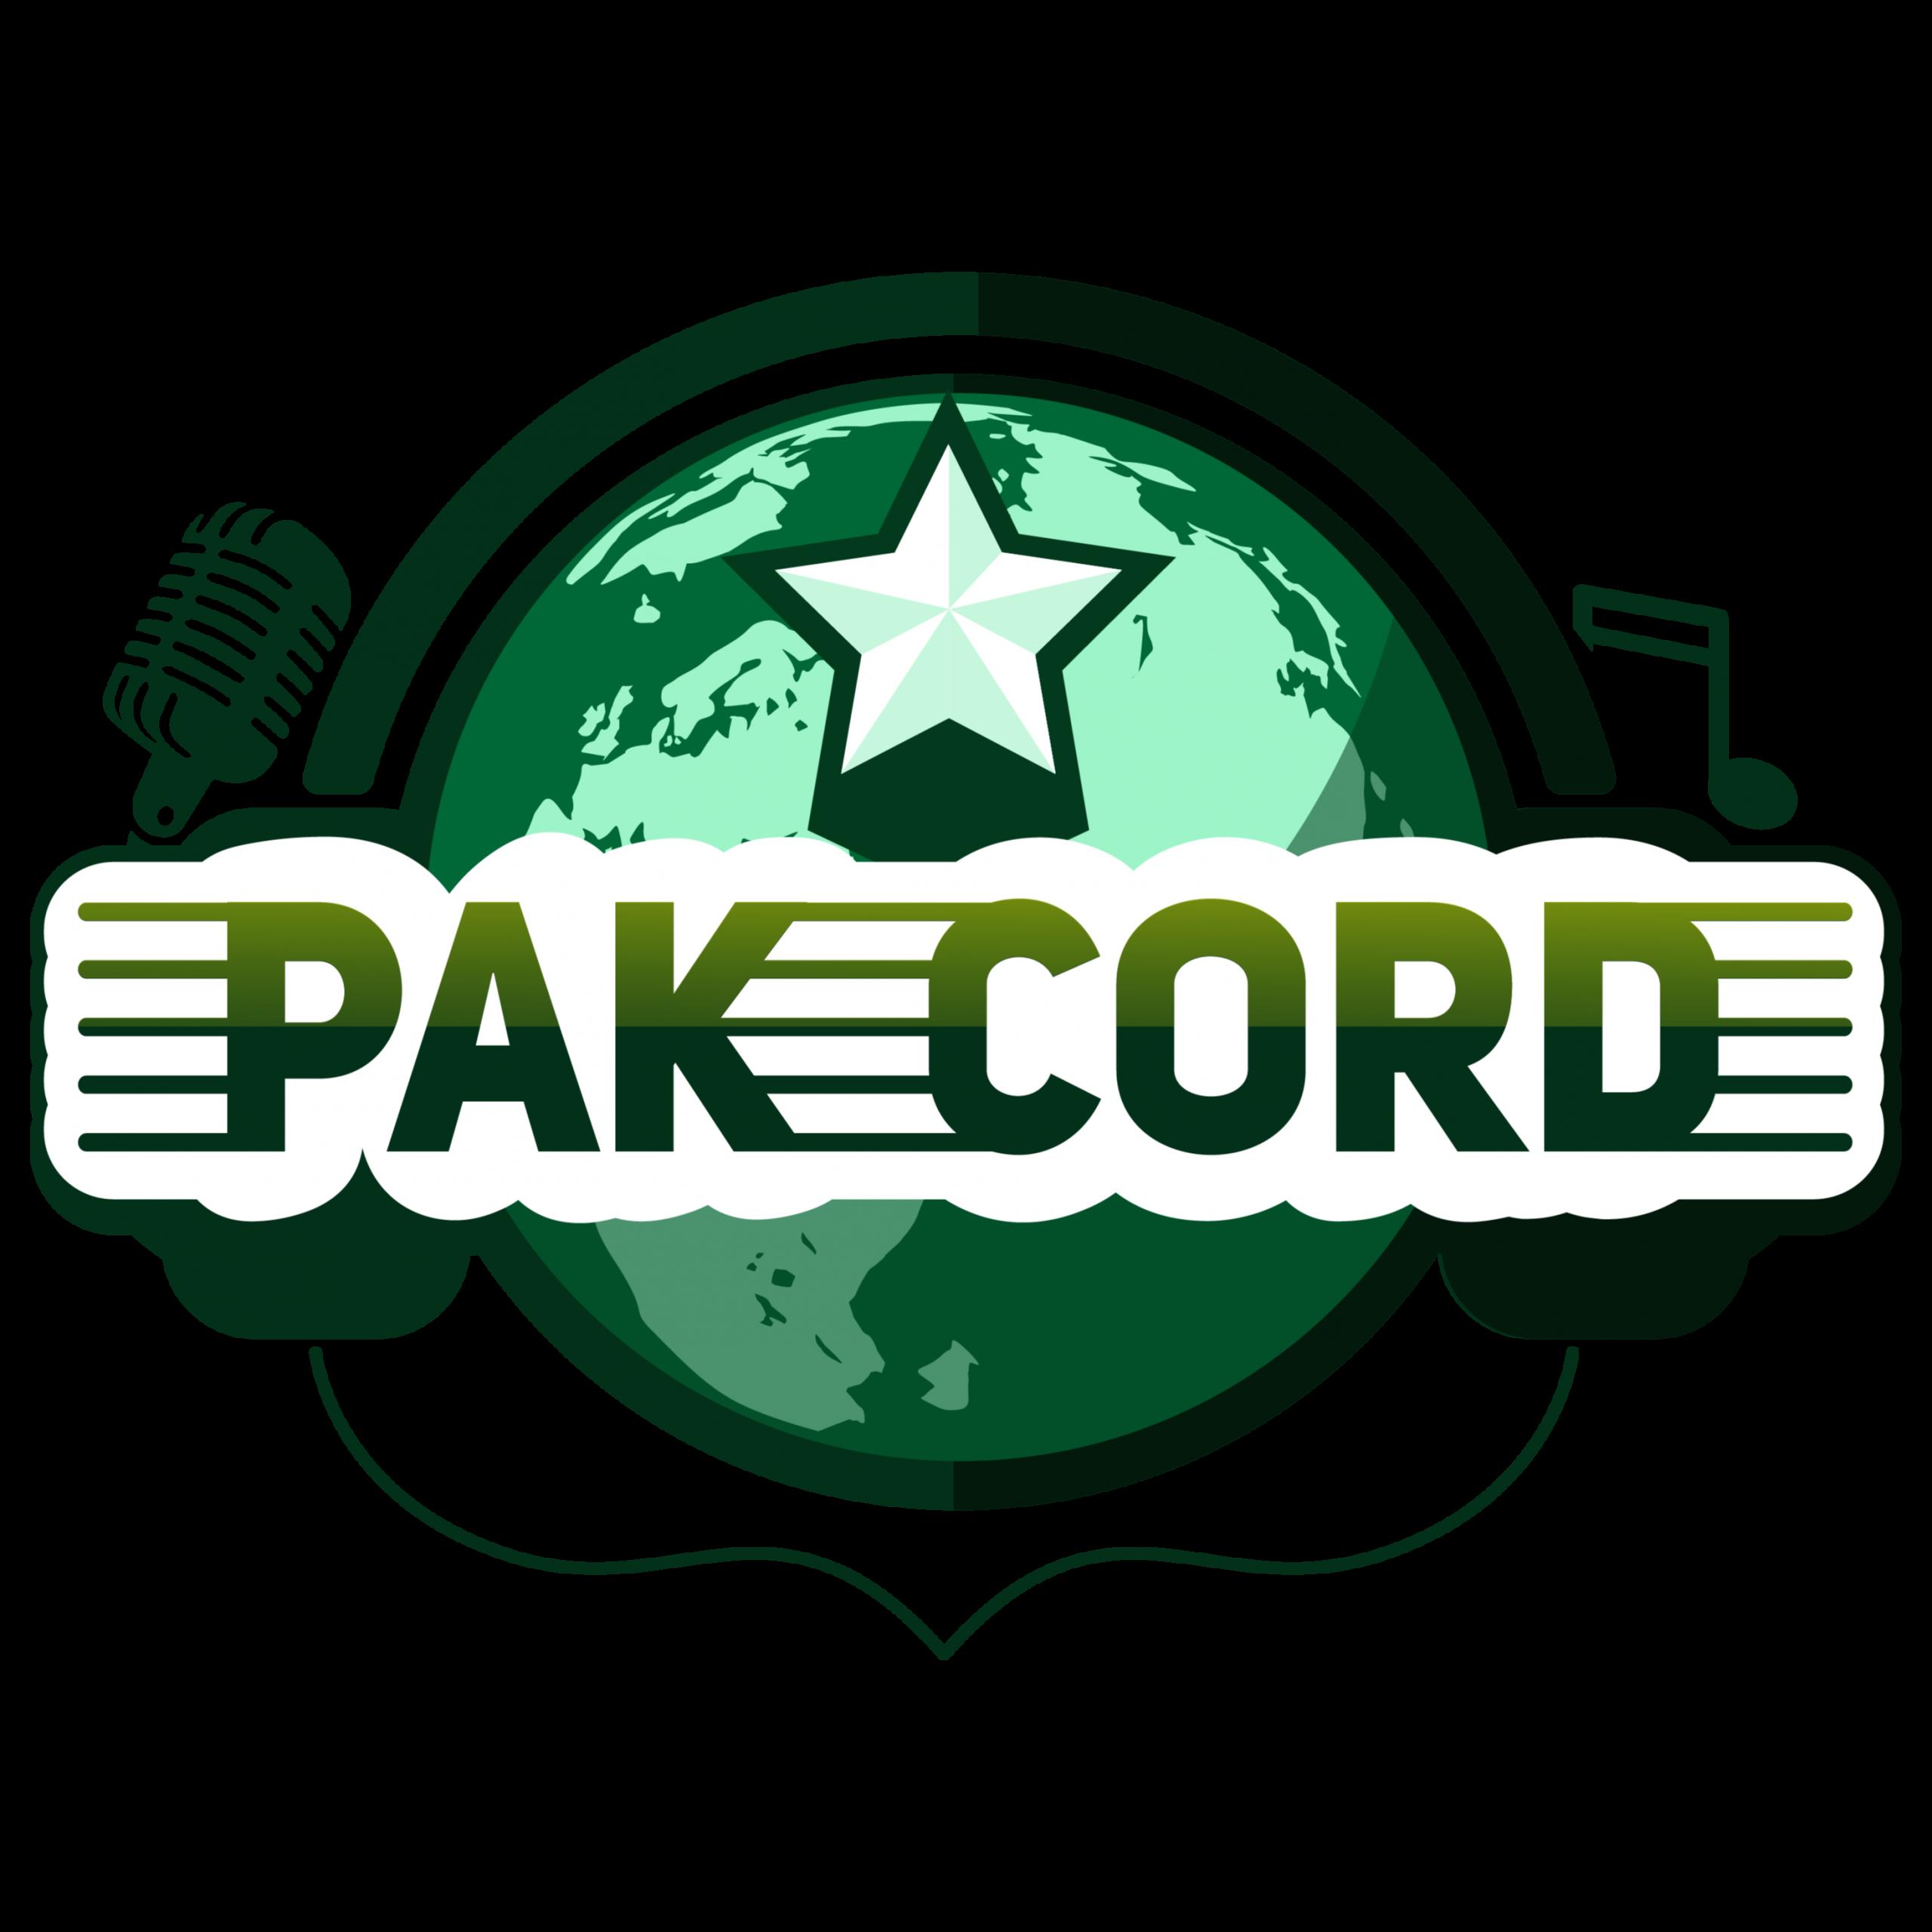 Pak-Cord